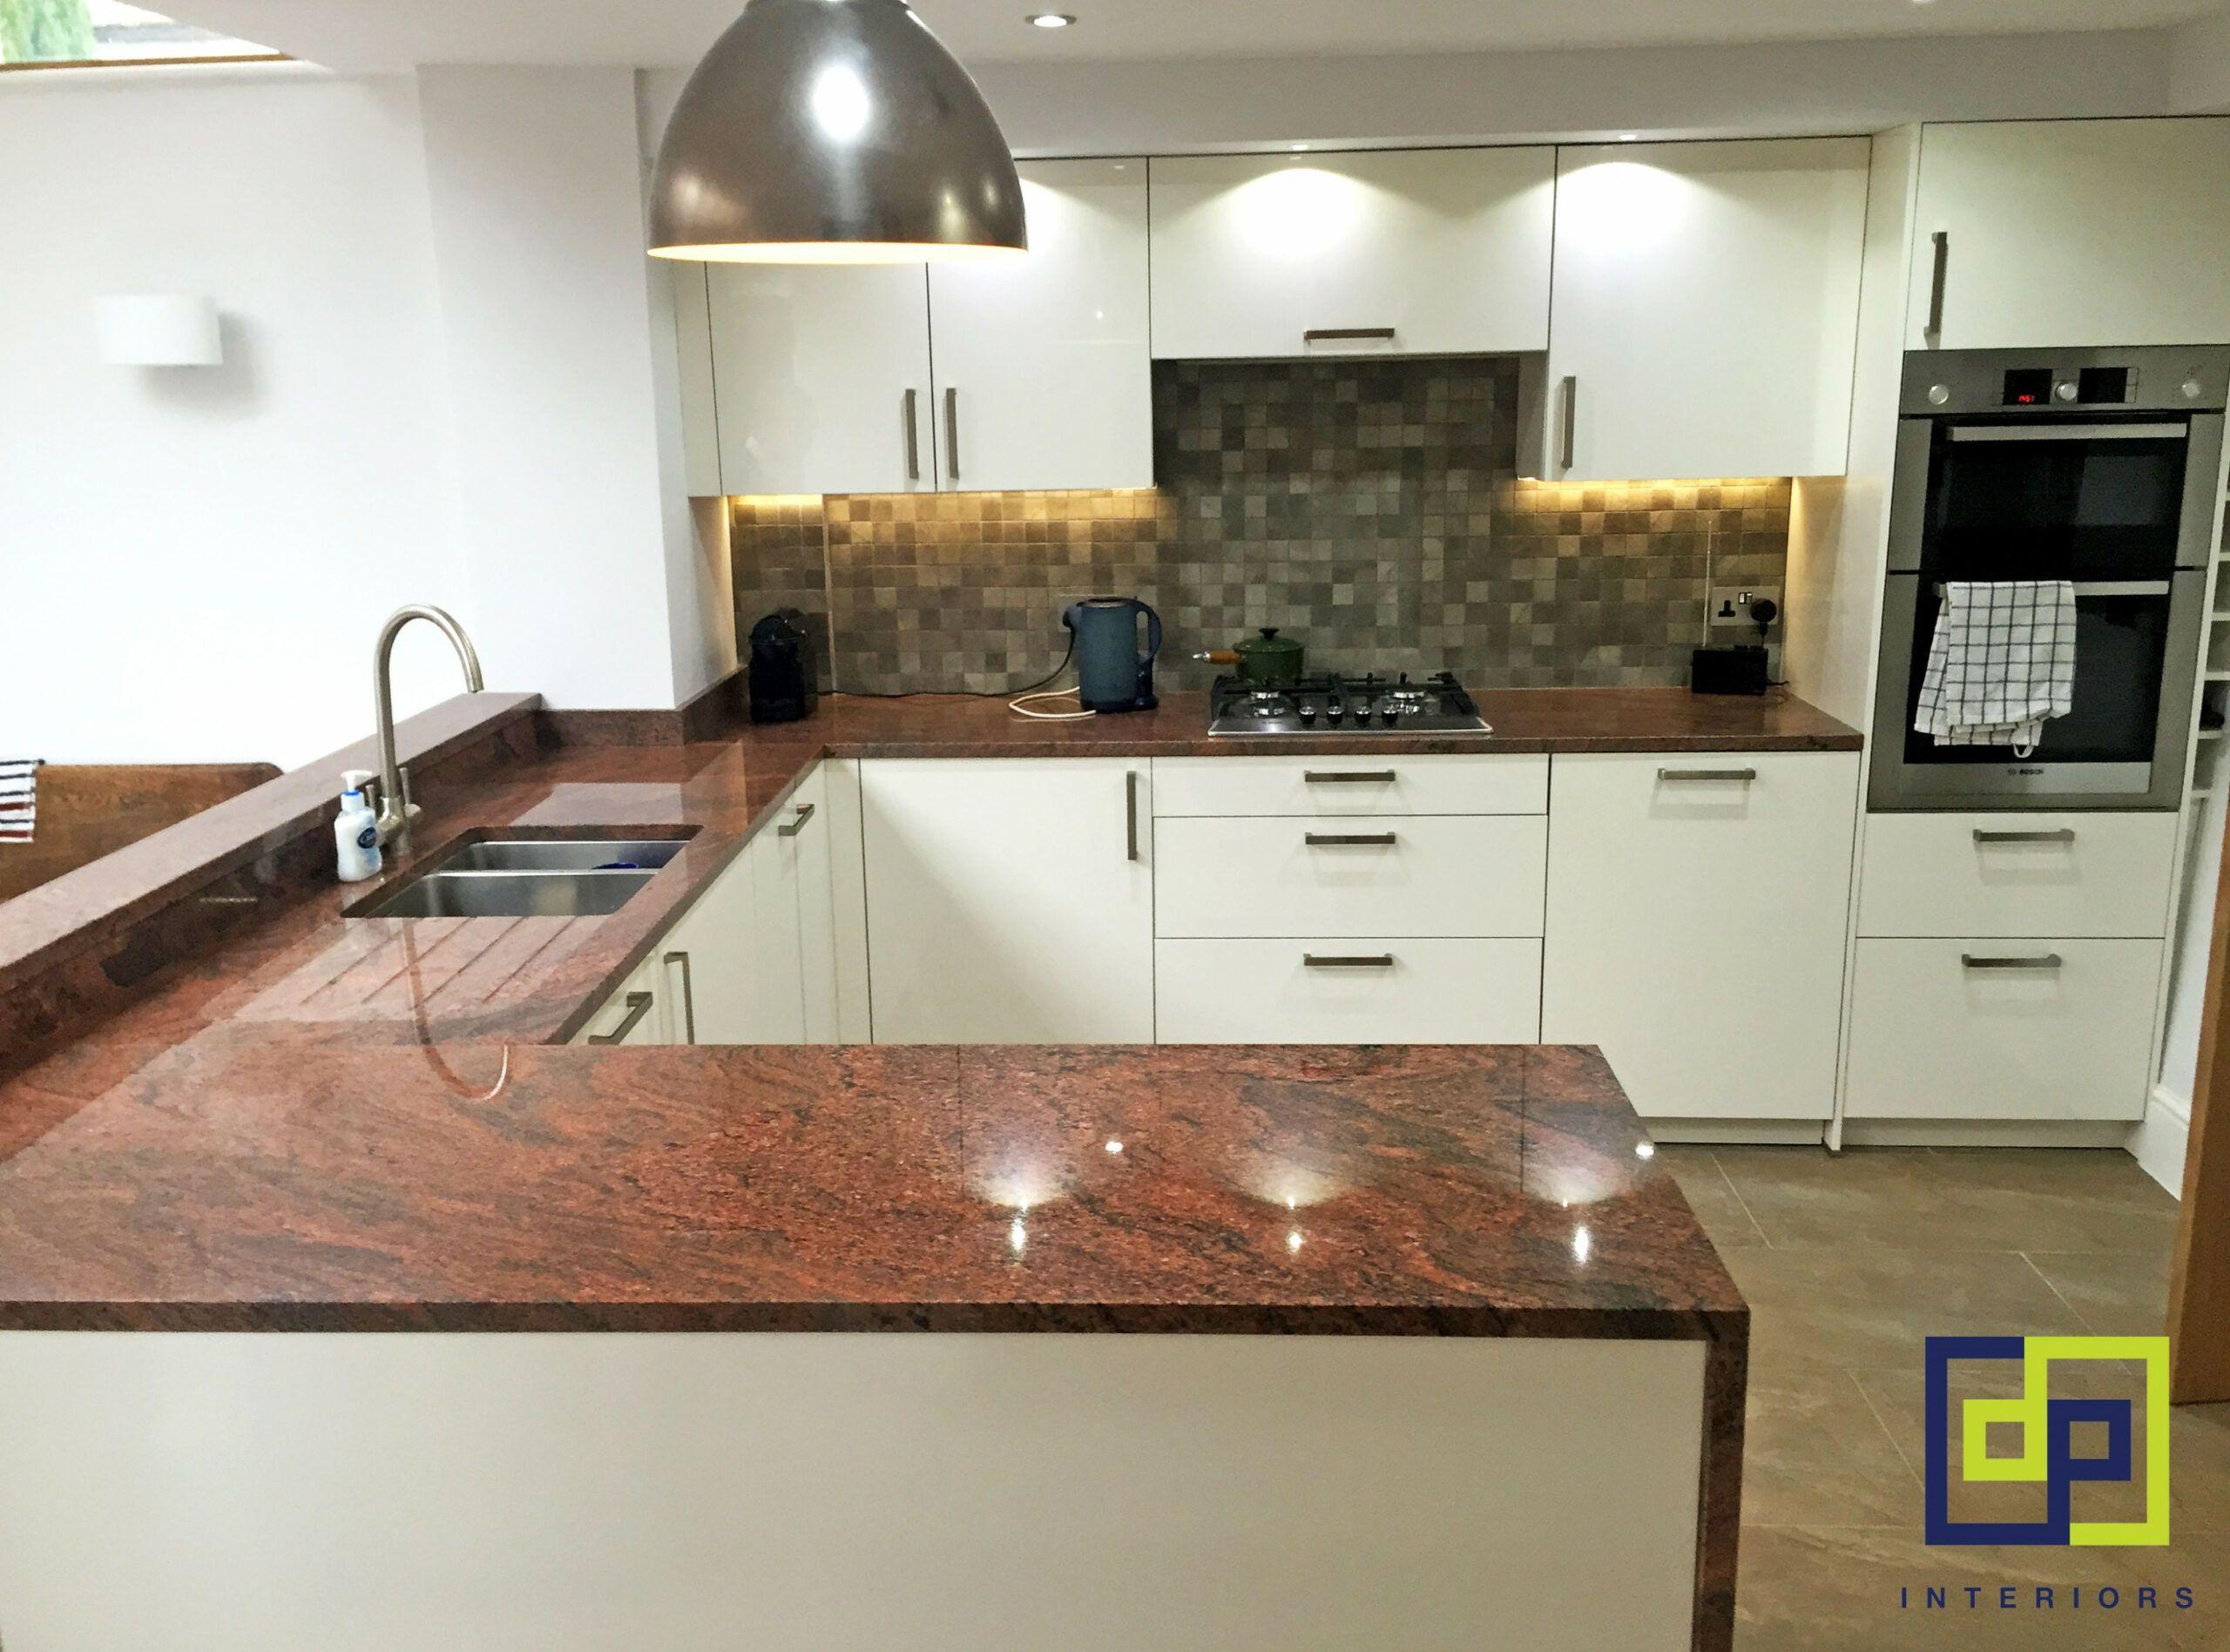 9 Where Are Manufacturer Stickers On Kitchen Cabinets In 2020 Granite Countertops Kitchen Red Granite Countertops Kitchen Cabinet Design